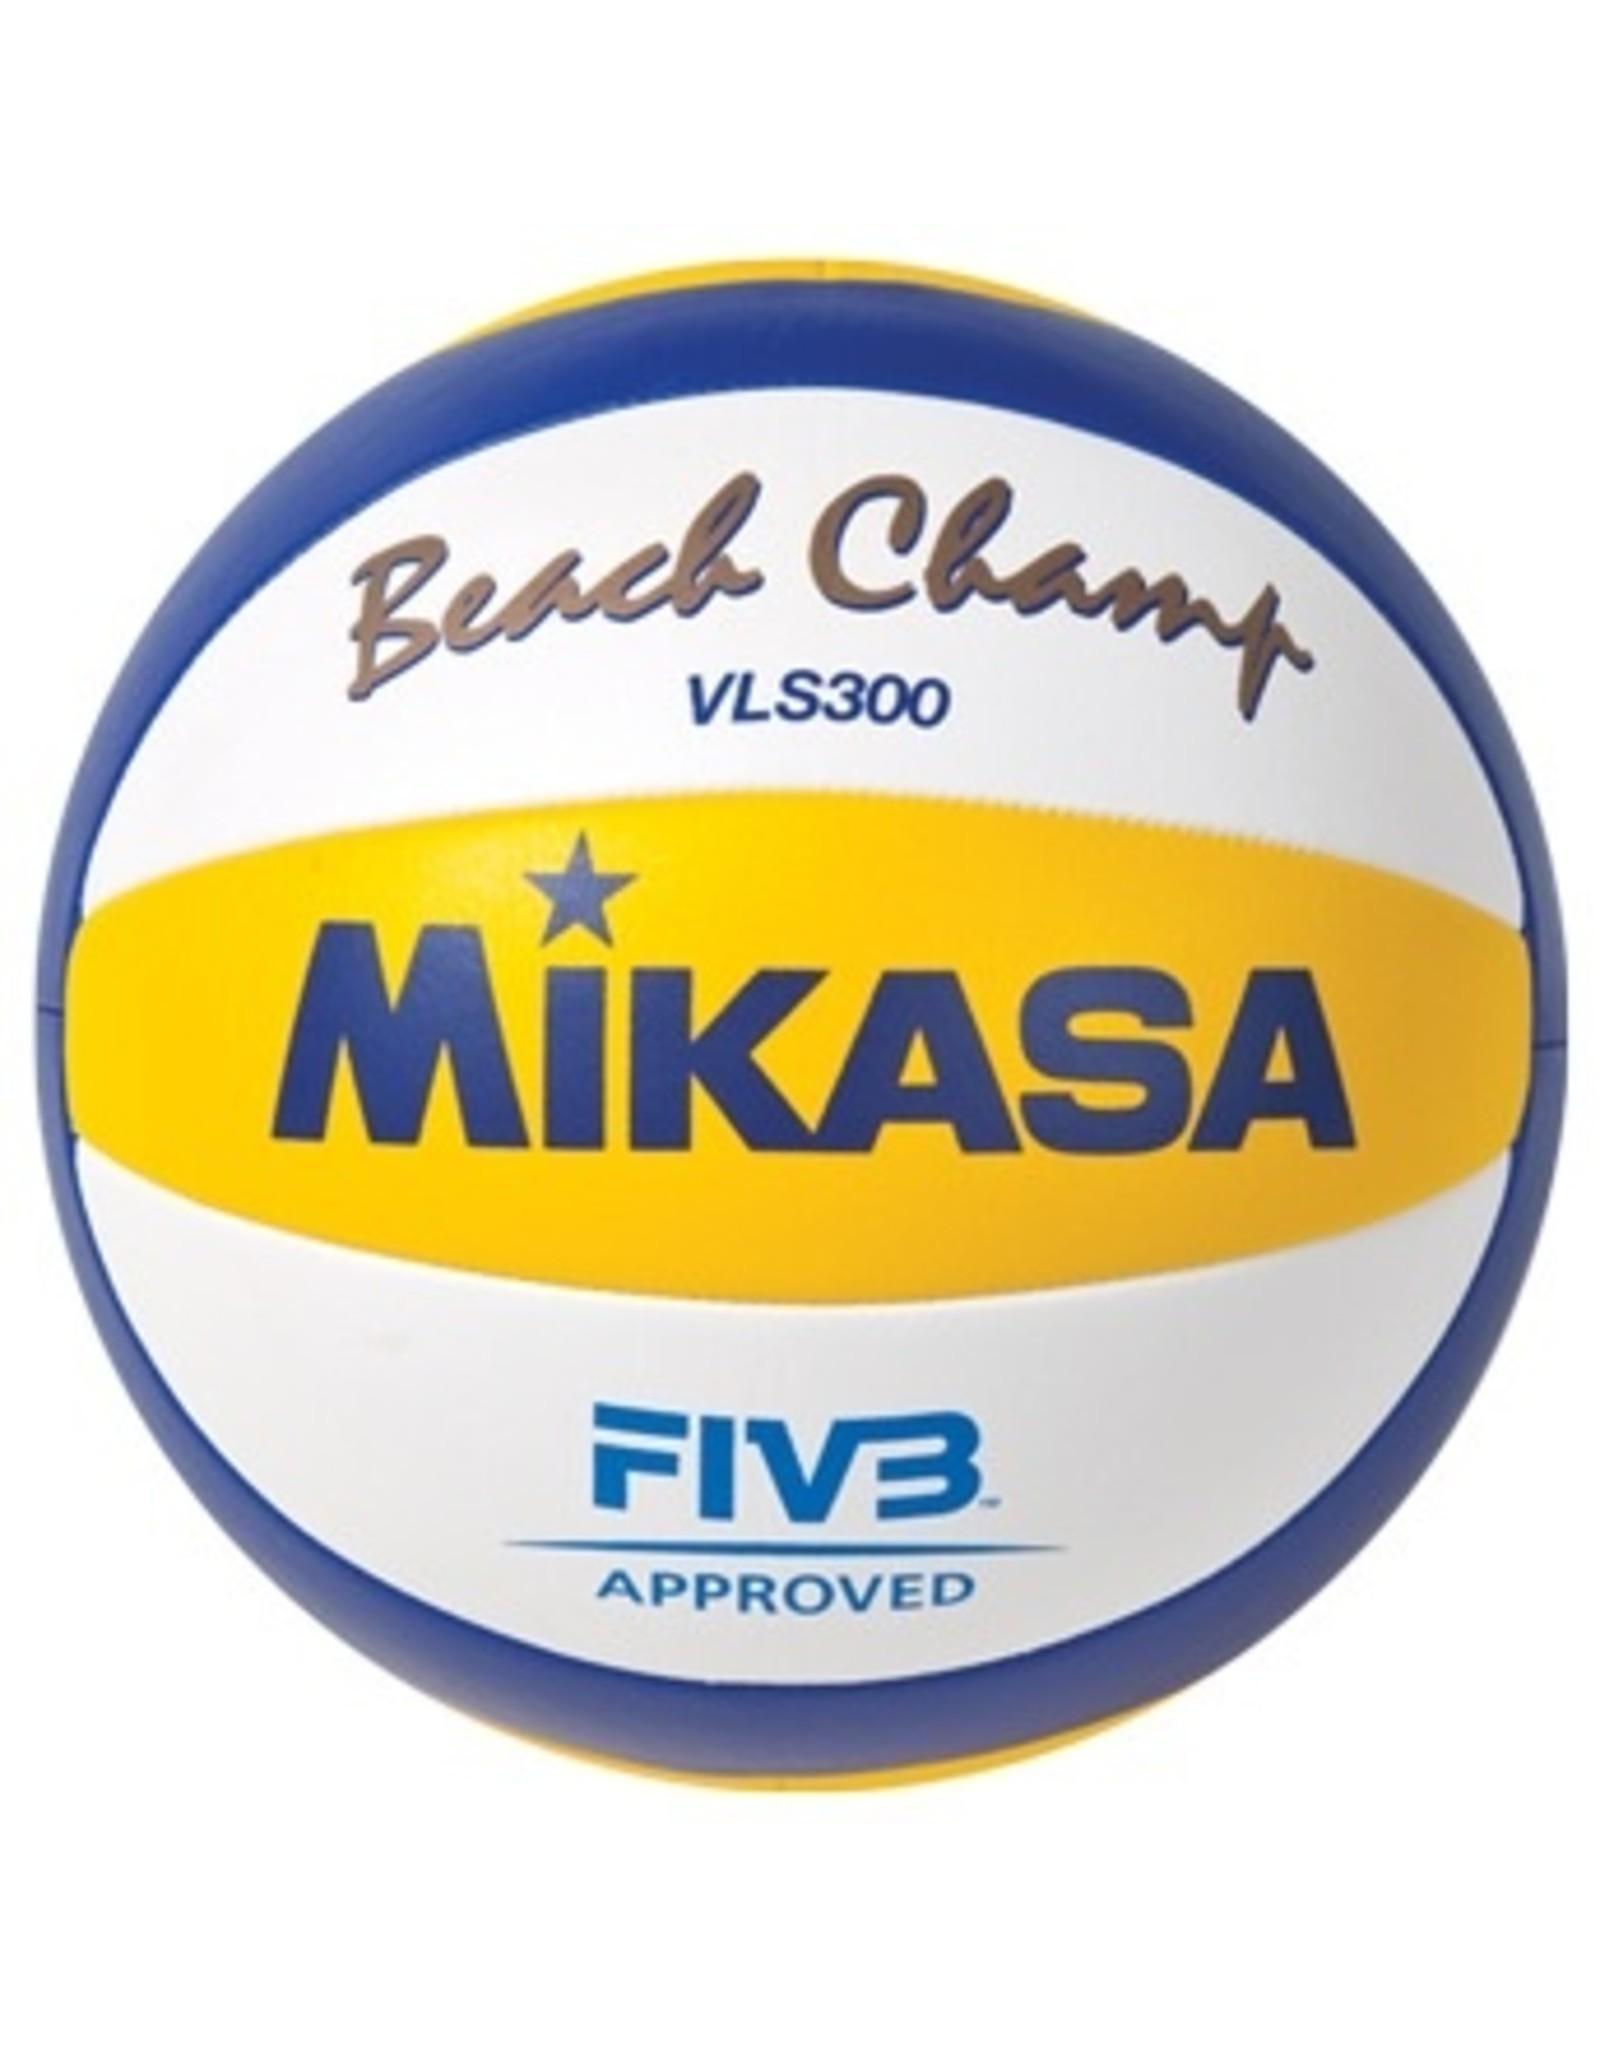 Mikasa VLS300 Official FIVB Game Ball